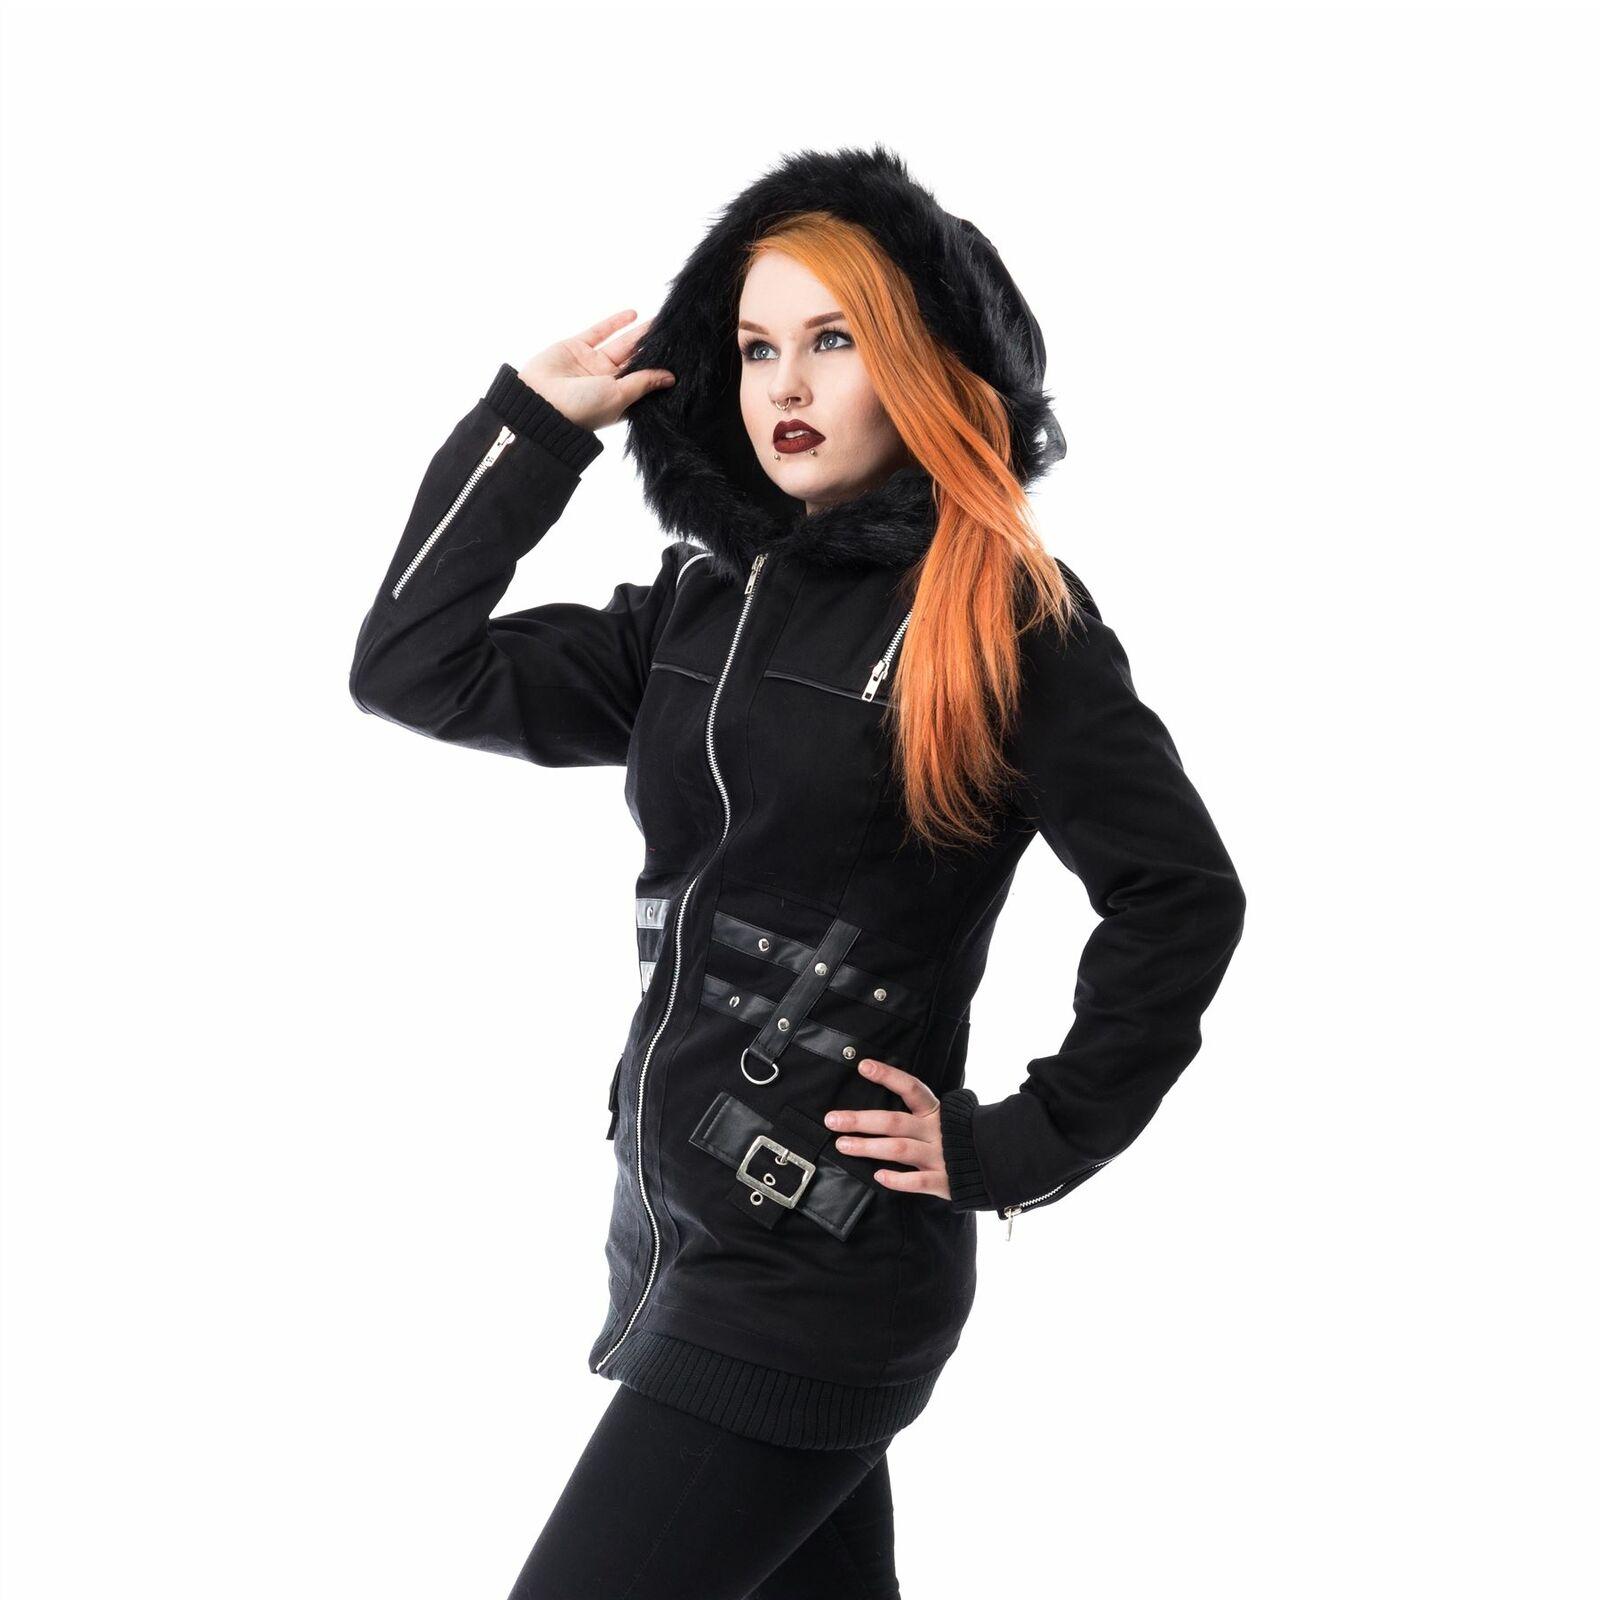 Heartless Sara Jacket Ladies Black Goth Emo Punk Women New Gothic Hooded Warm